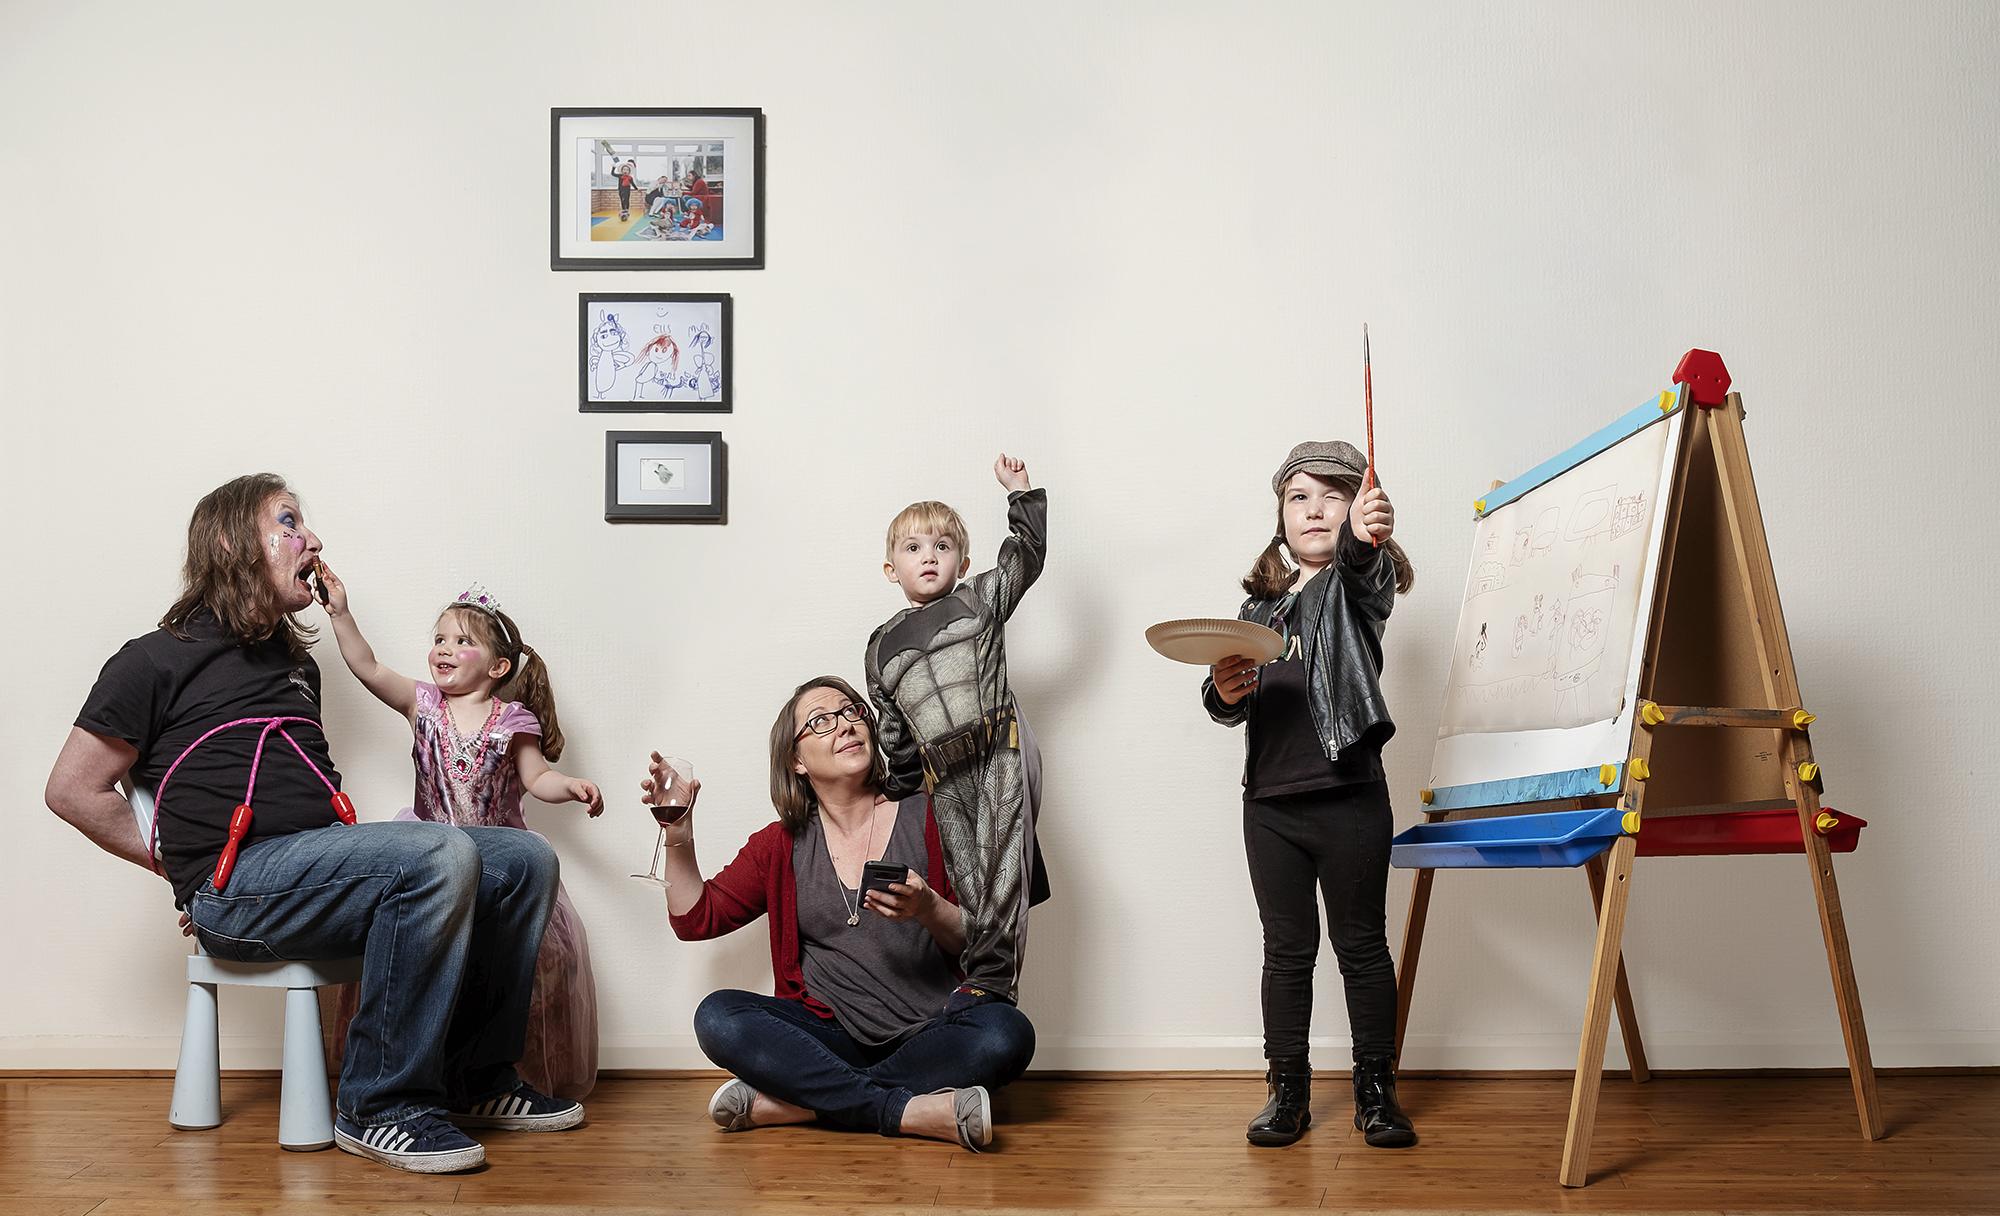 Advertising_Family_Portrait_Photography_George_Fairbairn_Photographer.jpg